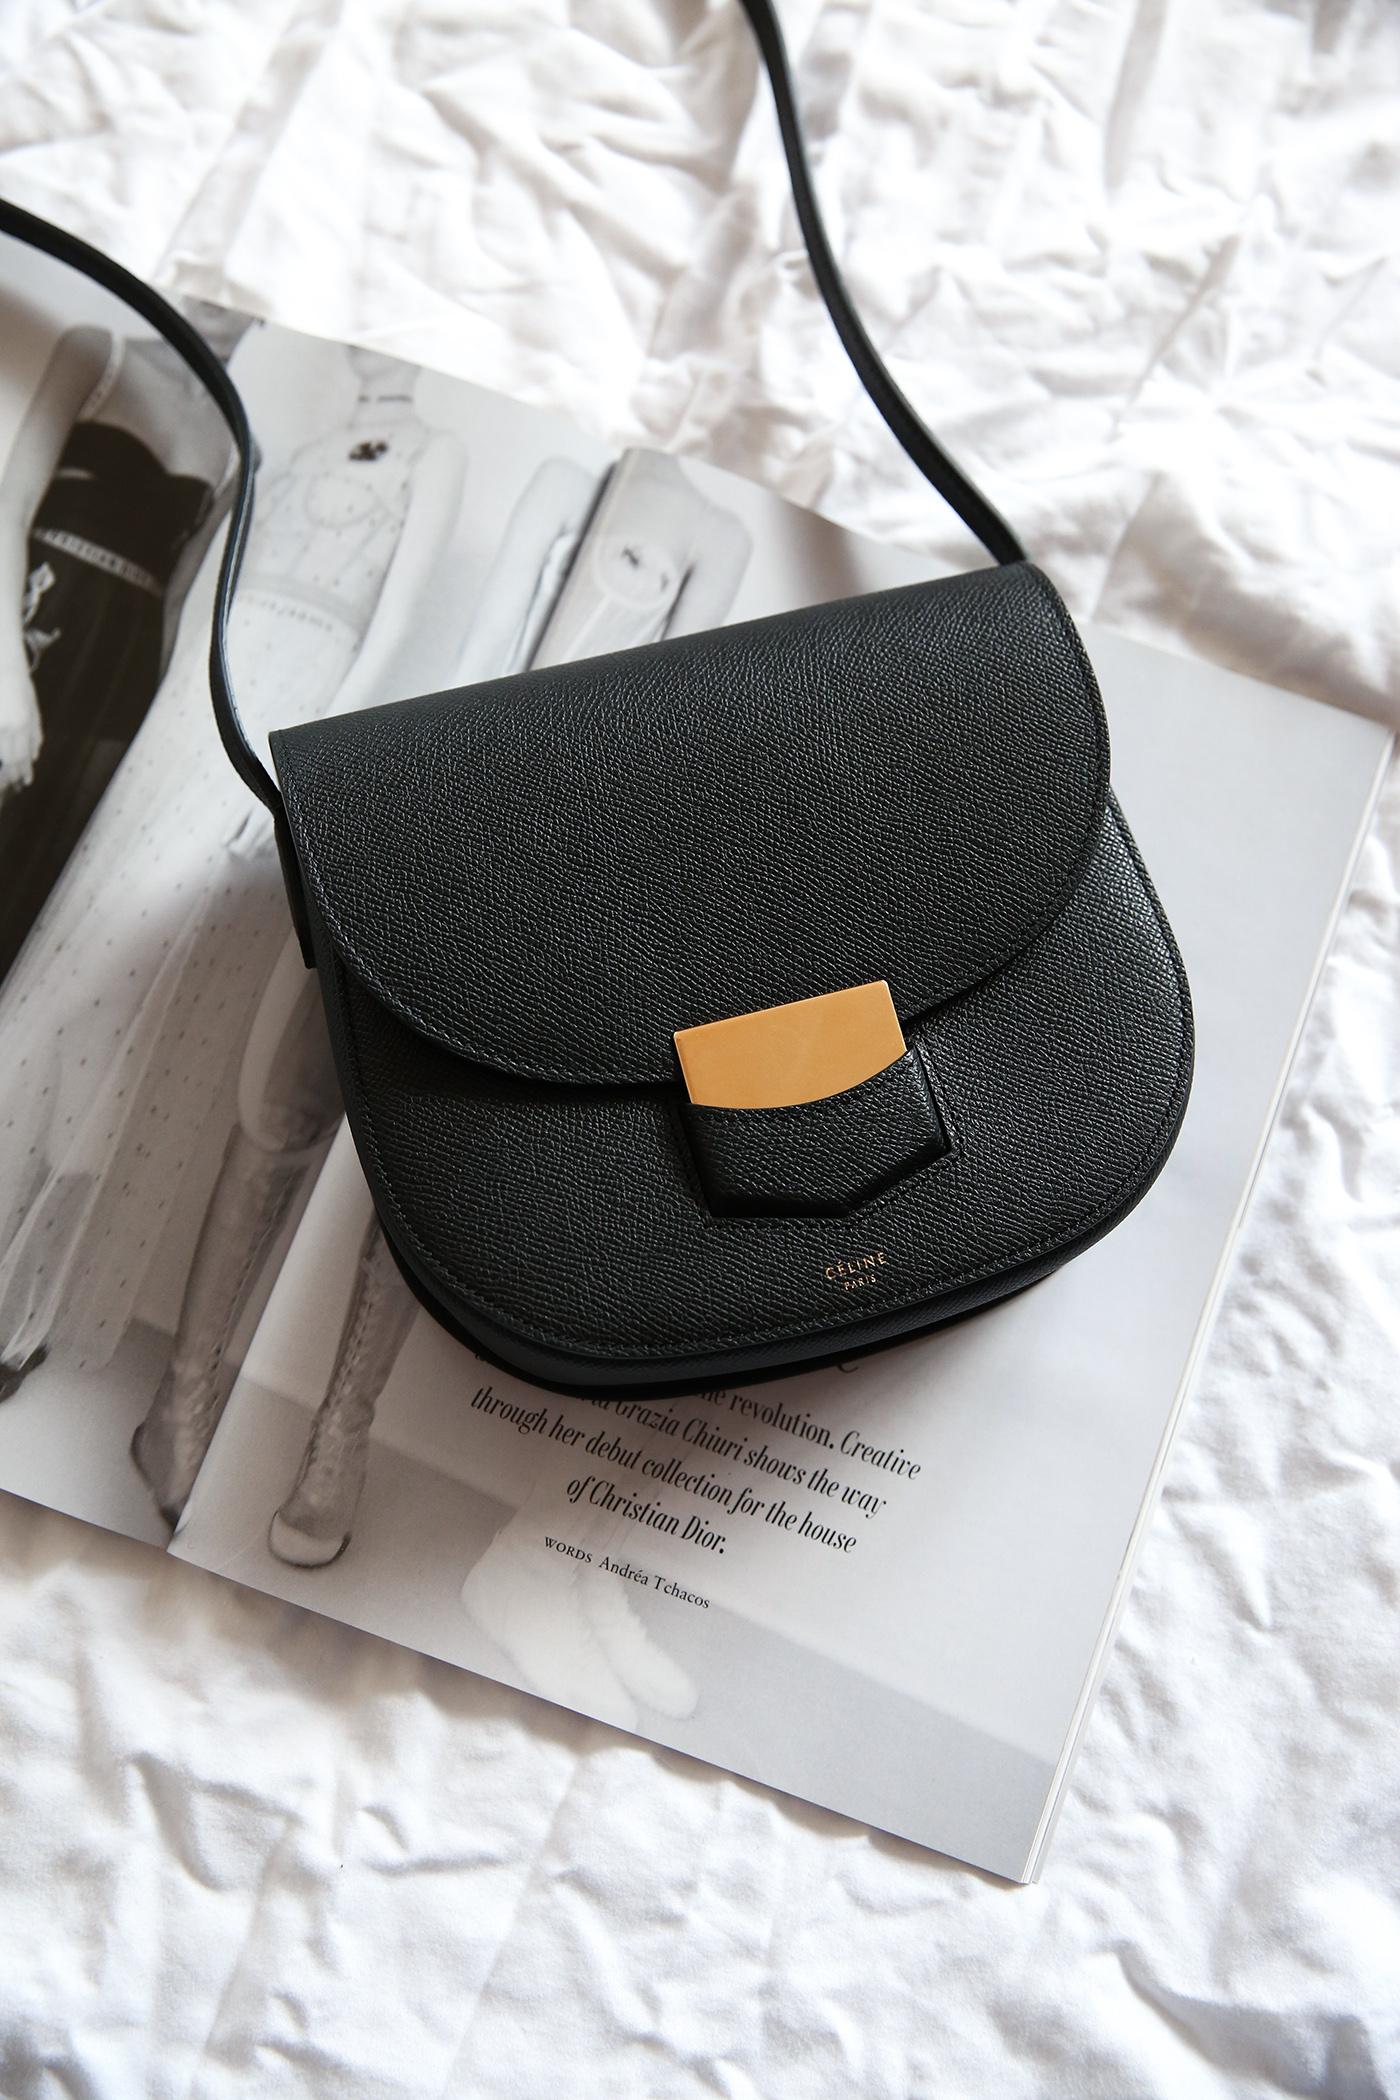 celine trotteur bag black leather minimal